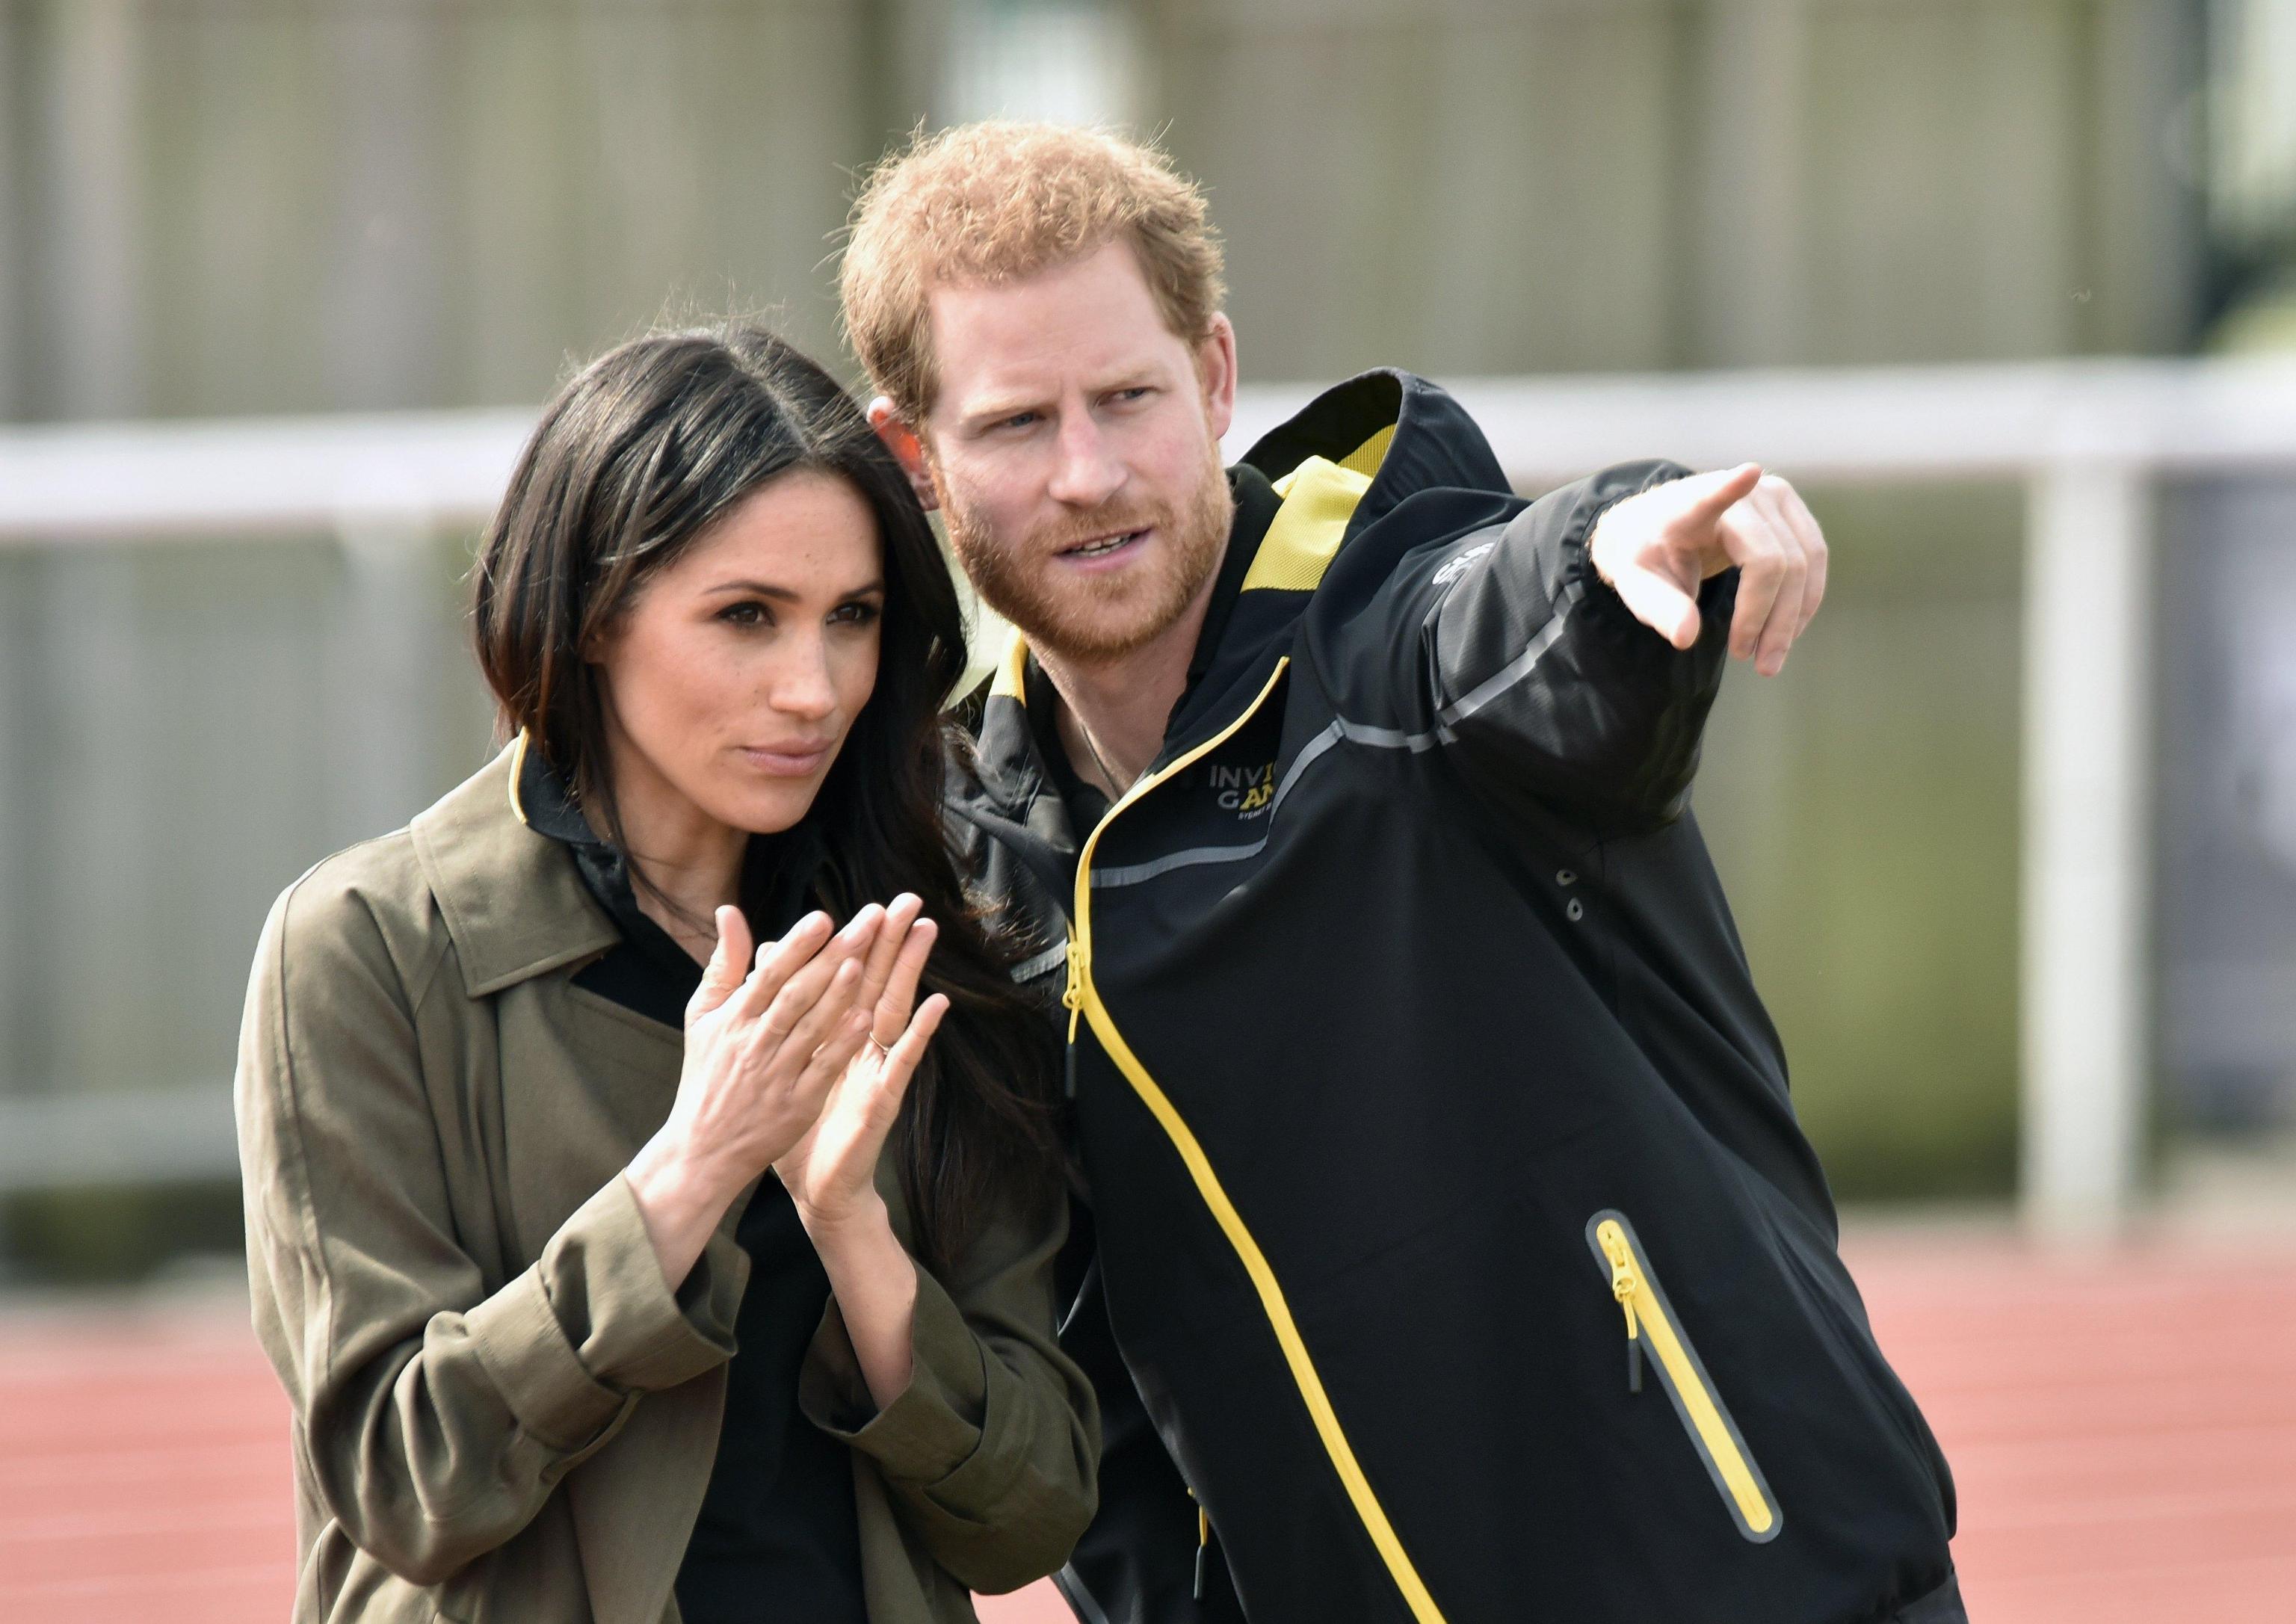 Prince Harry and Meghan Markle visit Bath University